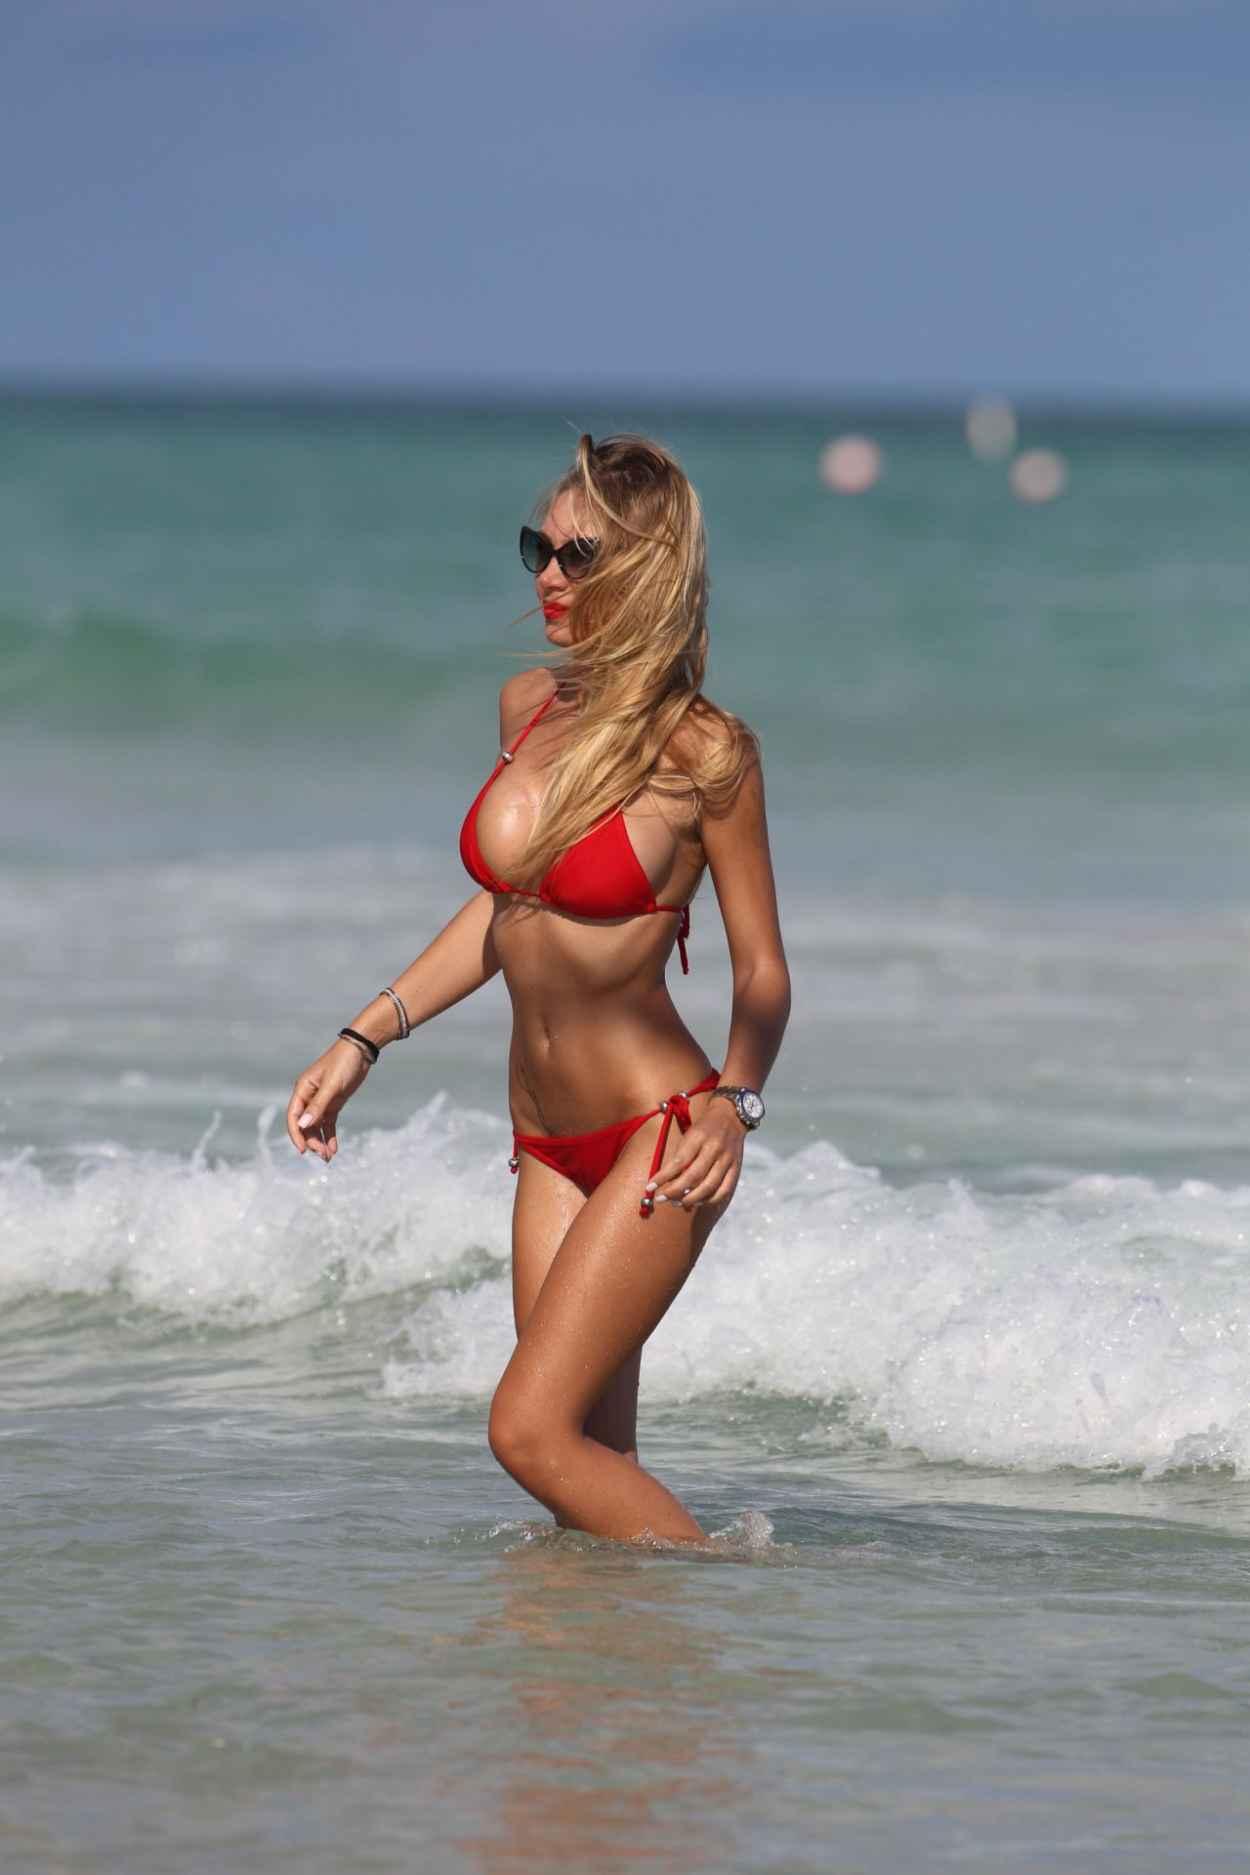 Laura Cremaschi in a Red Triangle Top Bikini - Miami Beach November 2015-1